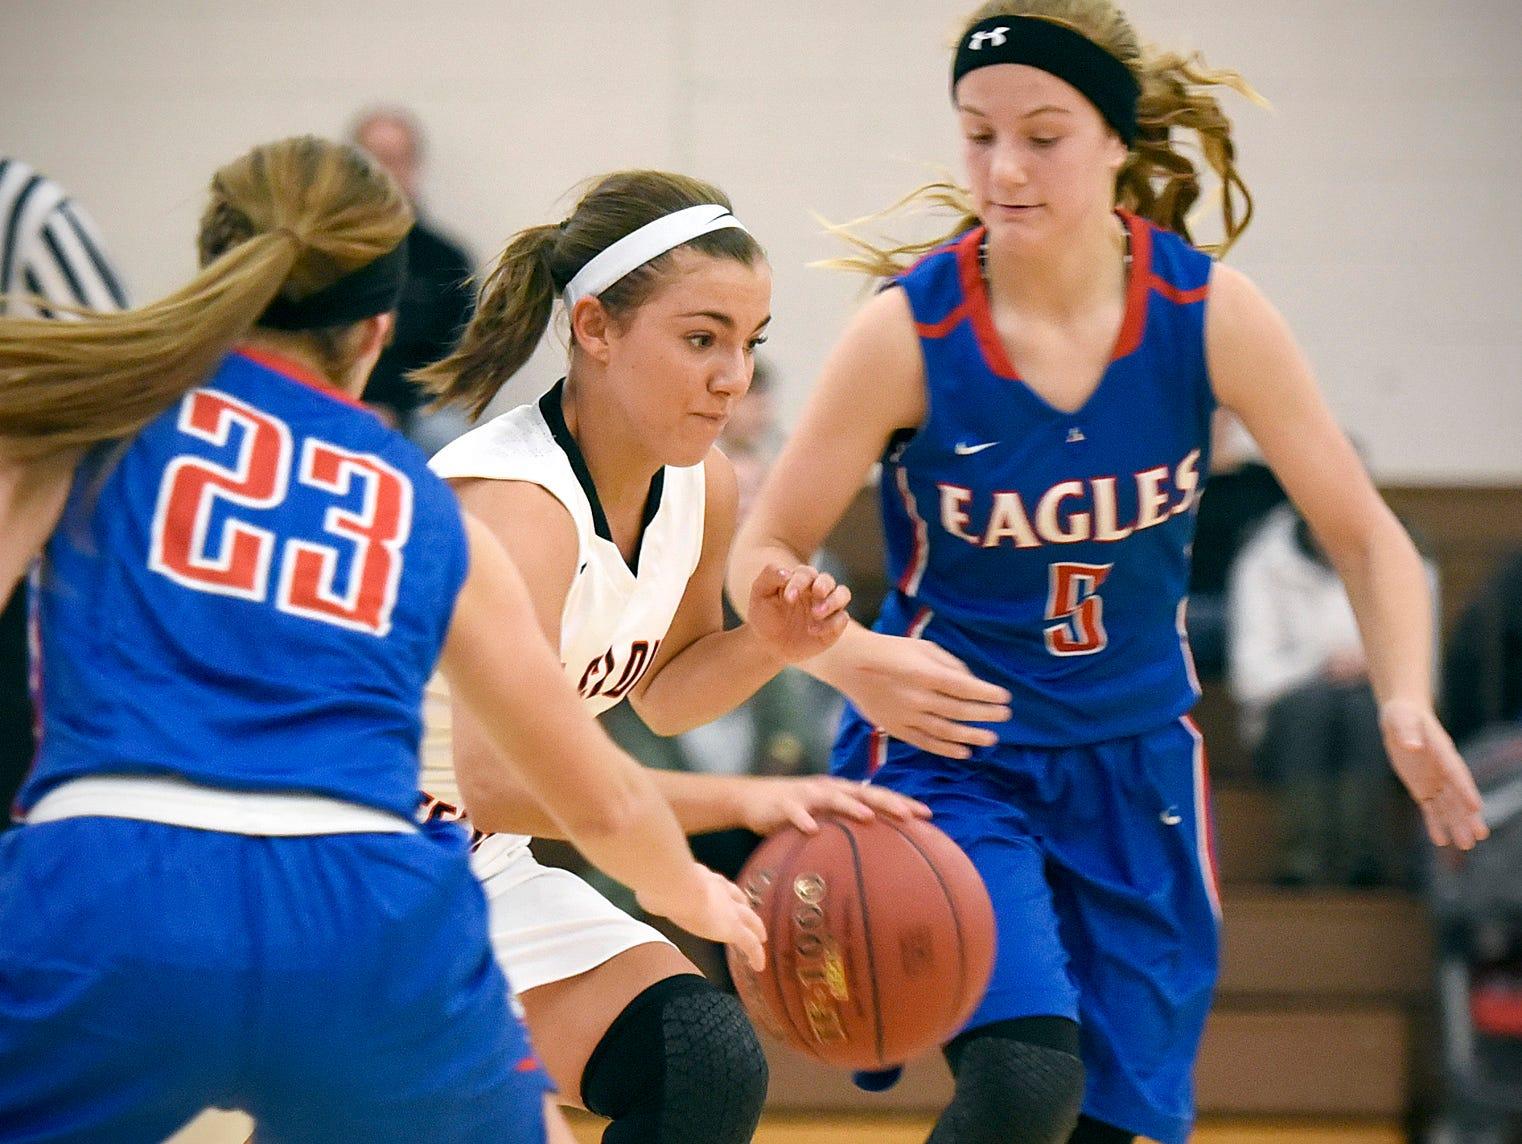 Tech's Mara Weaver takes the ball between Apollo's Calli Lynch, left, and Ashley Koepp during the first half Tuesday, Dec. 8 at Apollo High School.